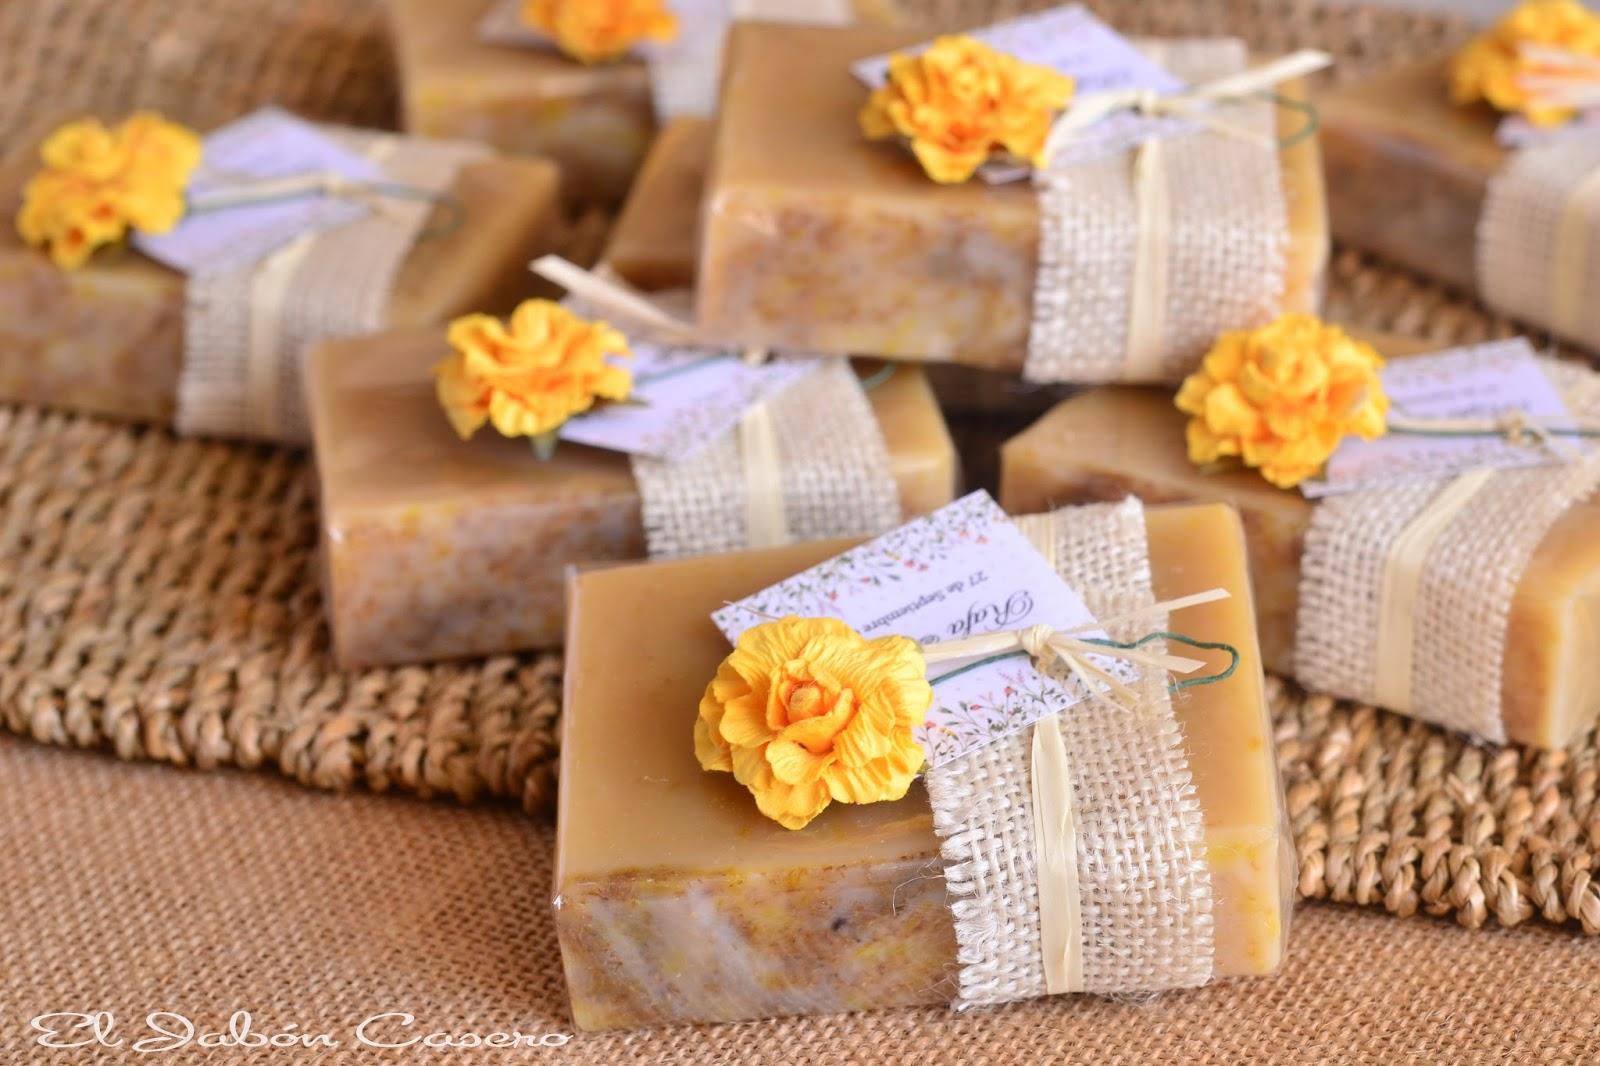 El jab n casero detalles naturales para bodas jabones - Detalles para decorar ...